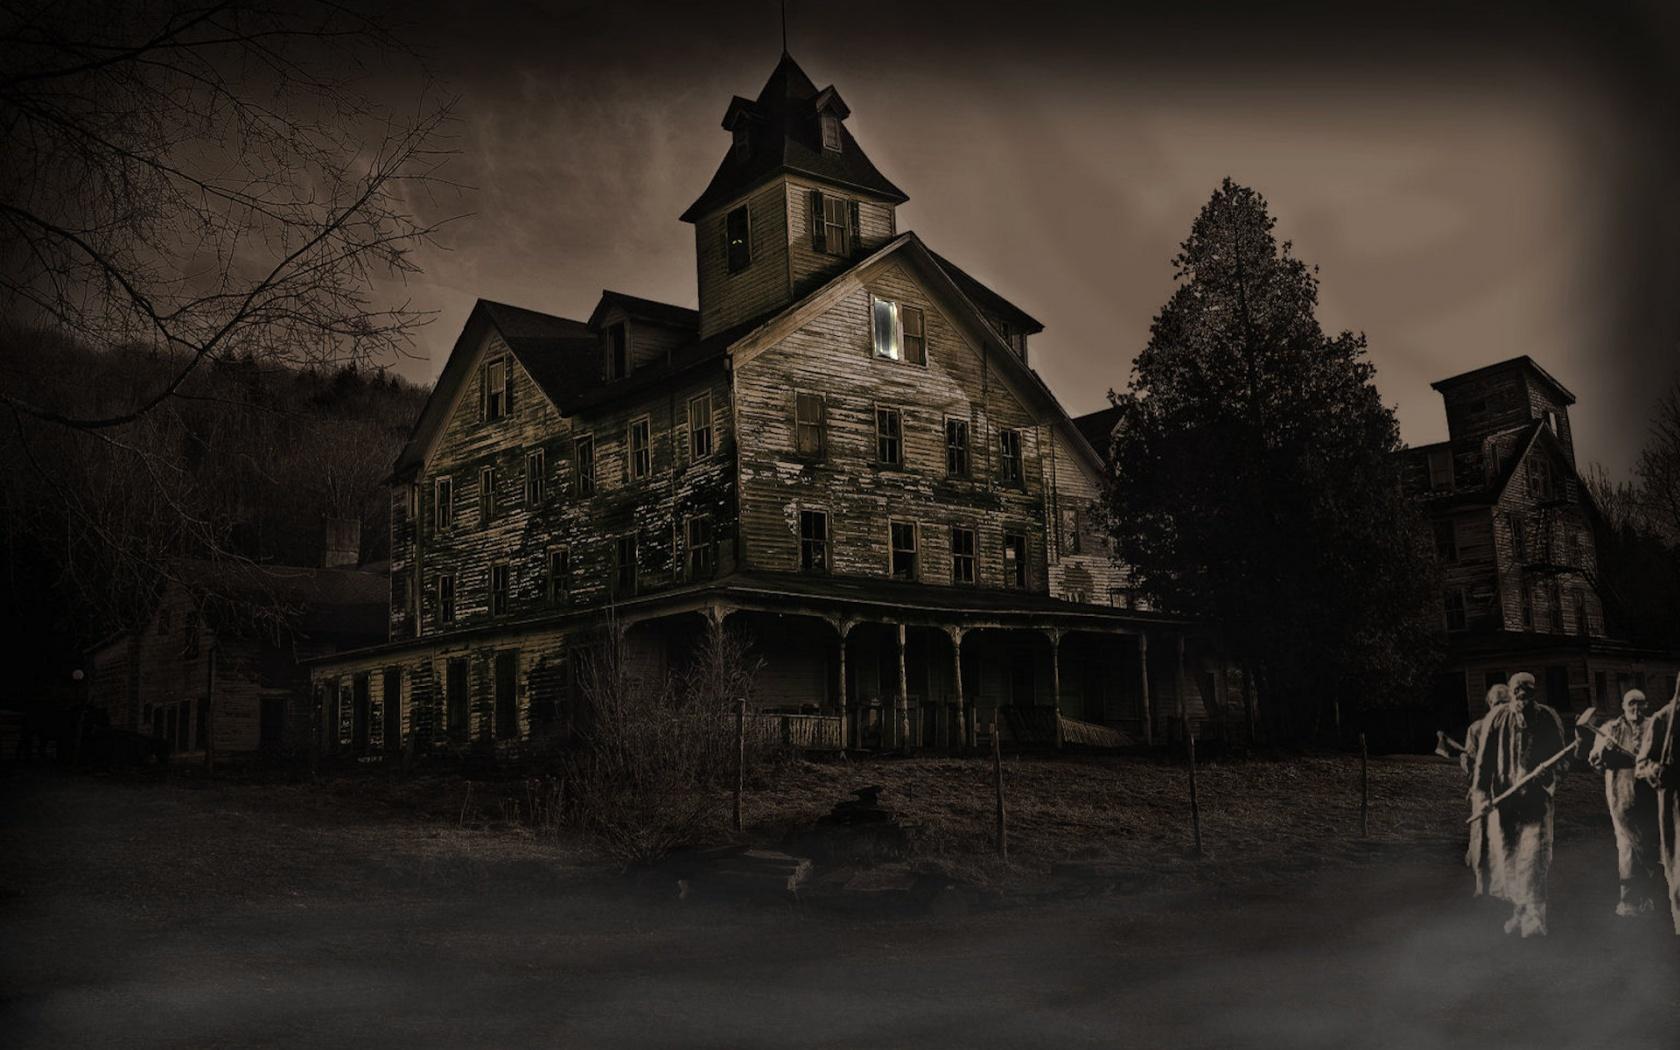 Haunted House Wallpaper   1680x1050 1680x1050